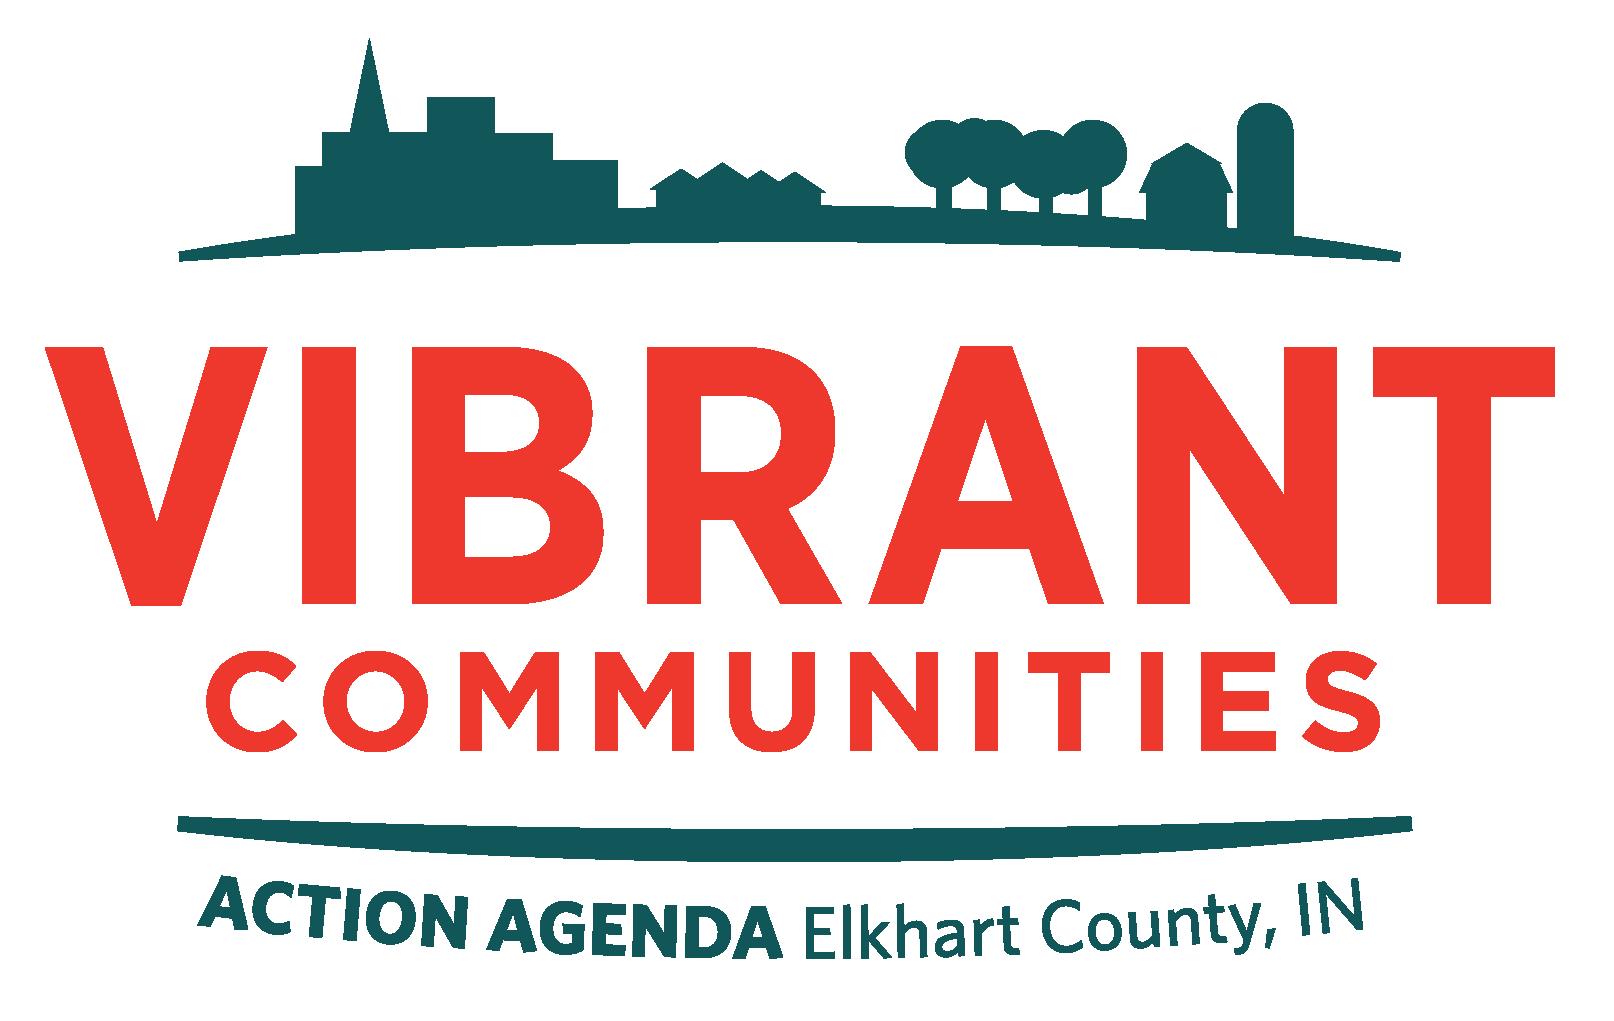 Introducing Vibrant Communities!